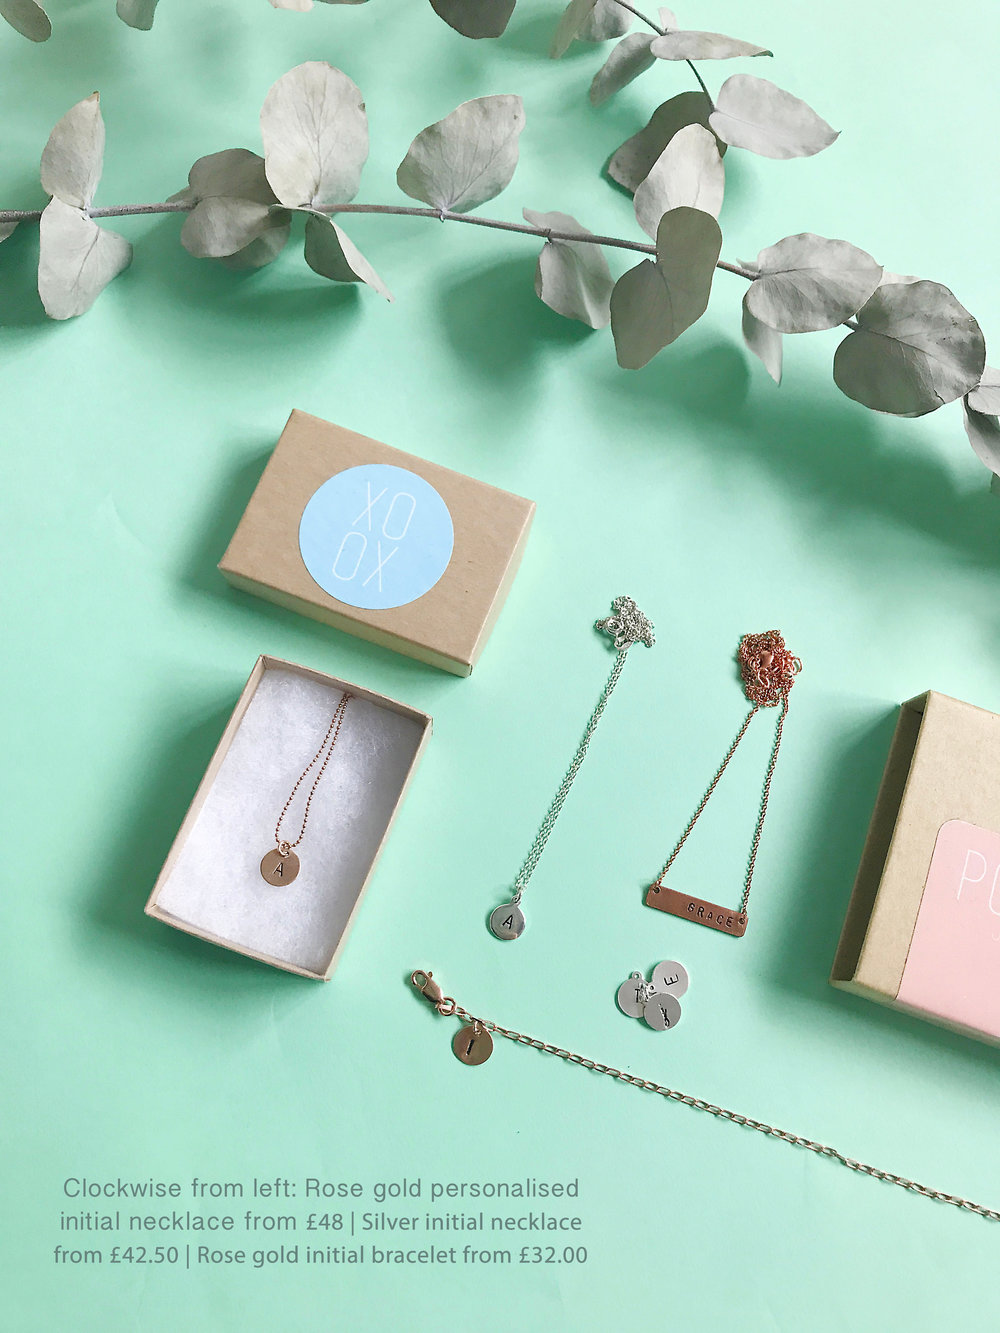 Christmas jewellery gift guide personalised jewellery mint flatlay.jpg